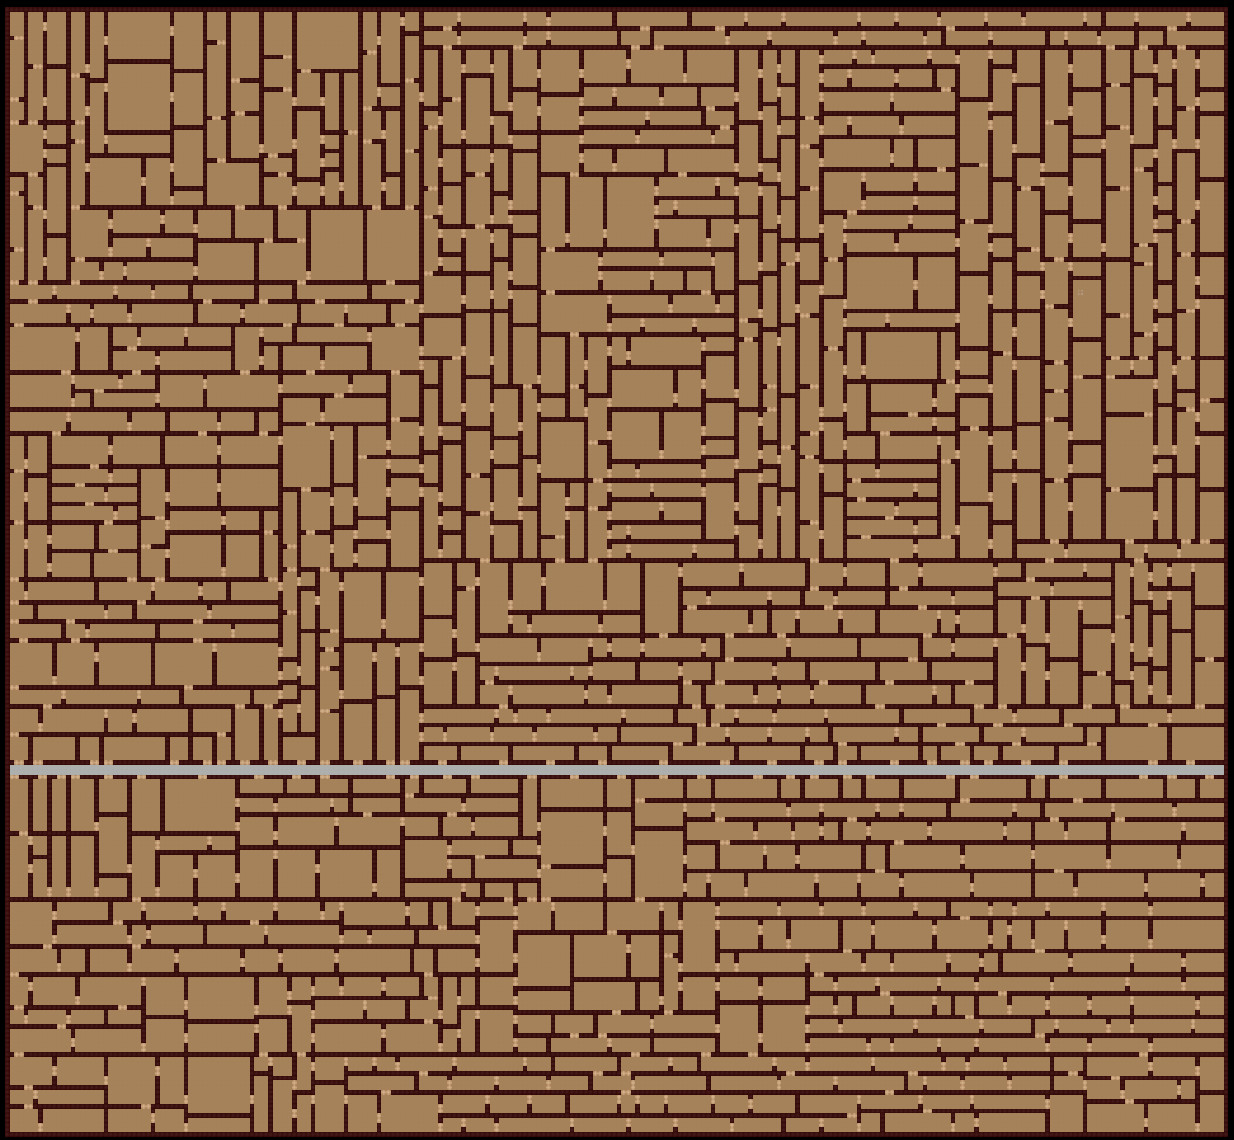 House Layout Maze Generator Polygon Pi